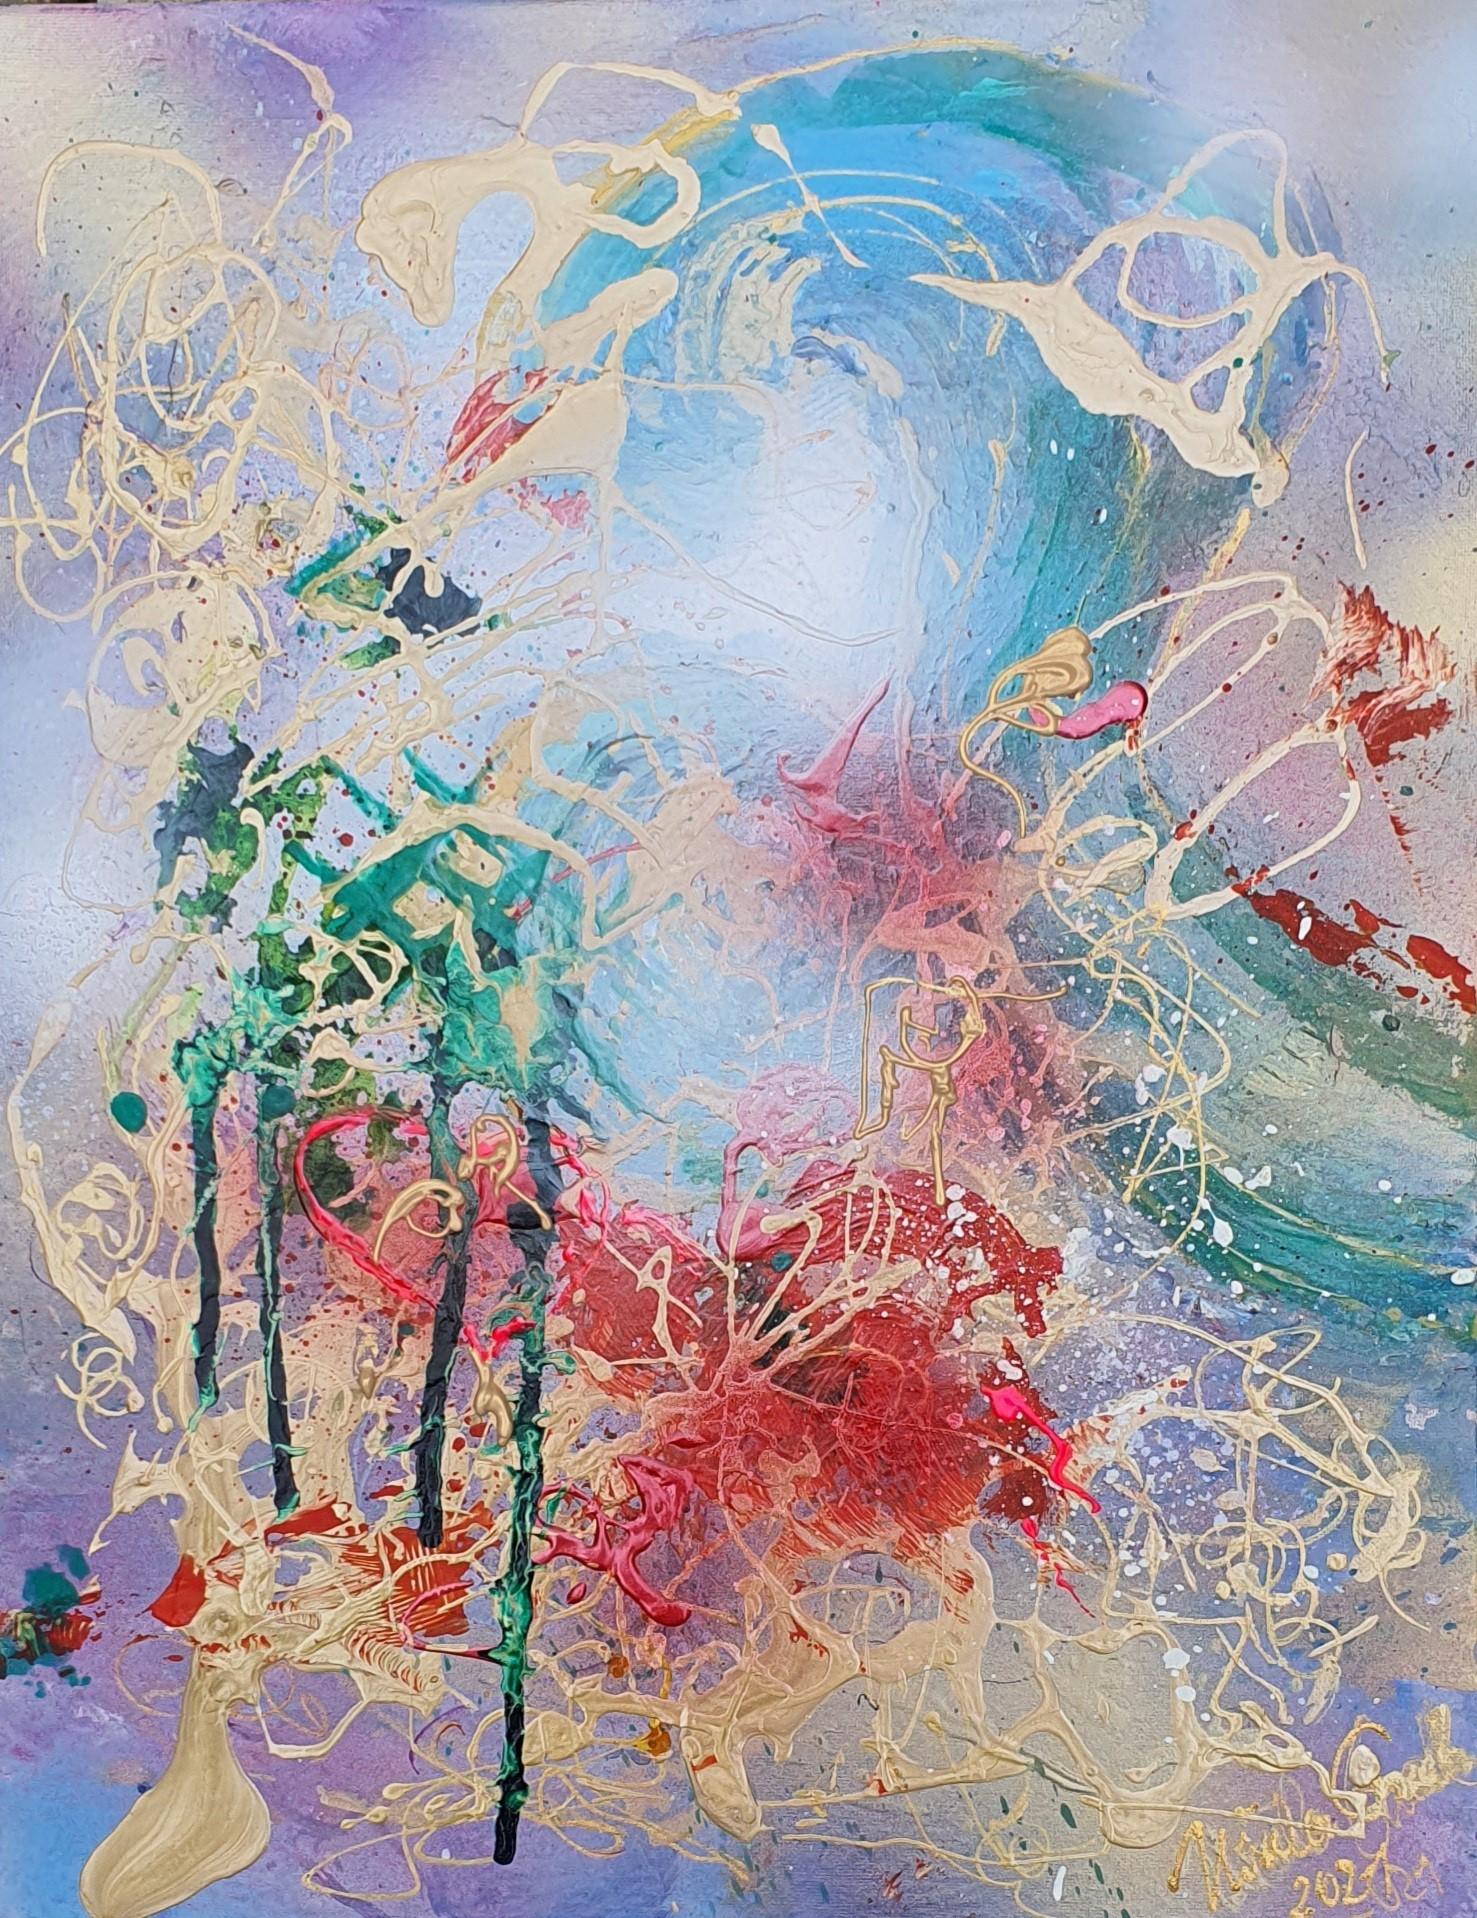 Summer-memories (Technic: Acryl/Mixed Media on Canvas *40 X 50 X 2 cm)